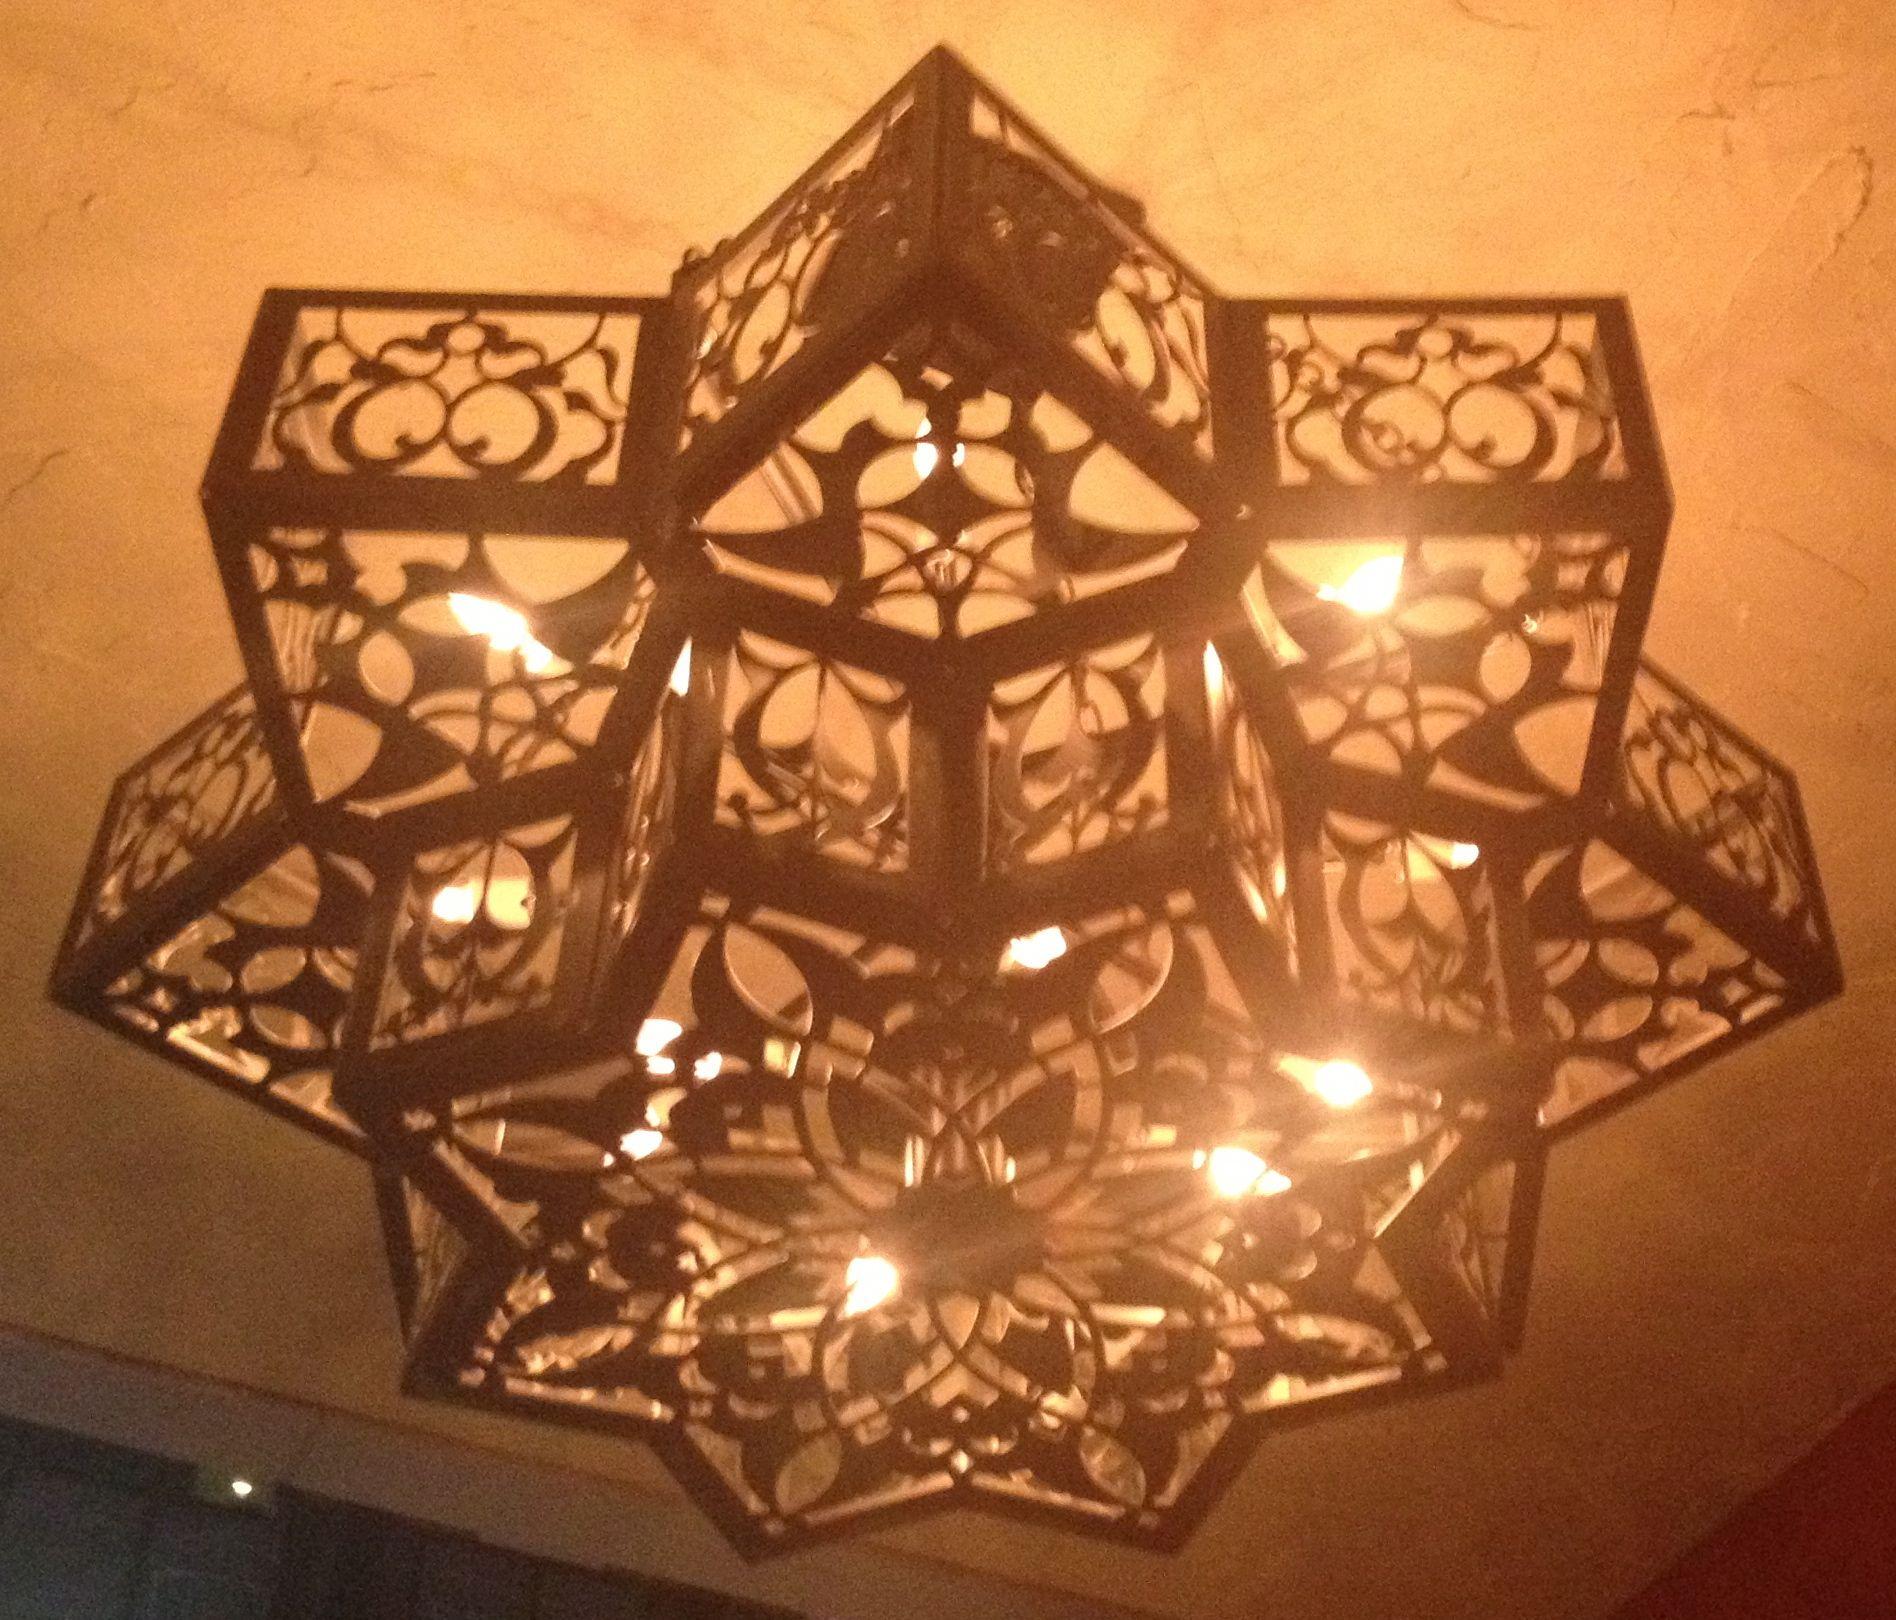 Uncle julios restaurant austin texas lighting pinterest uncle julios restaurant austin texas arubaitofo Gallery